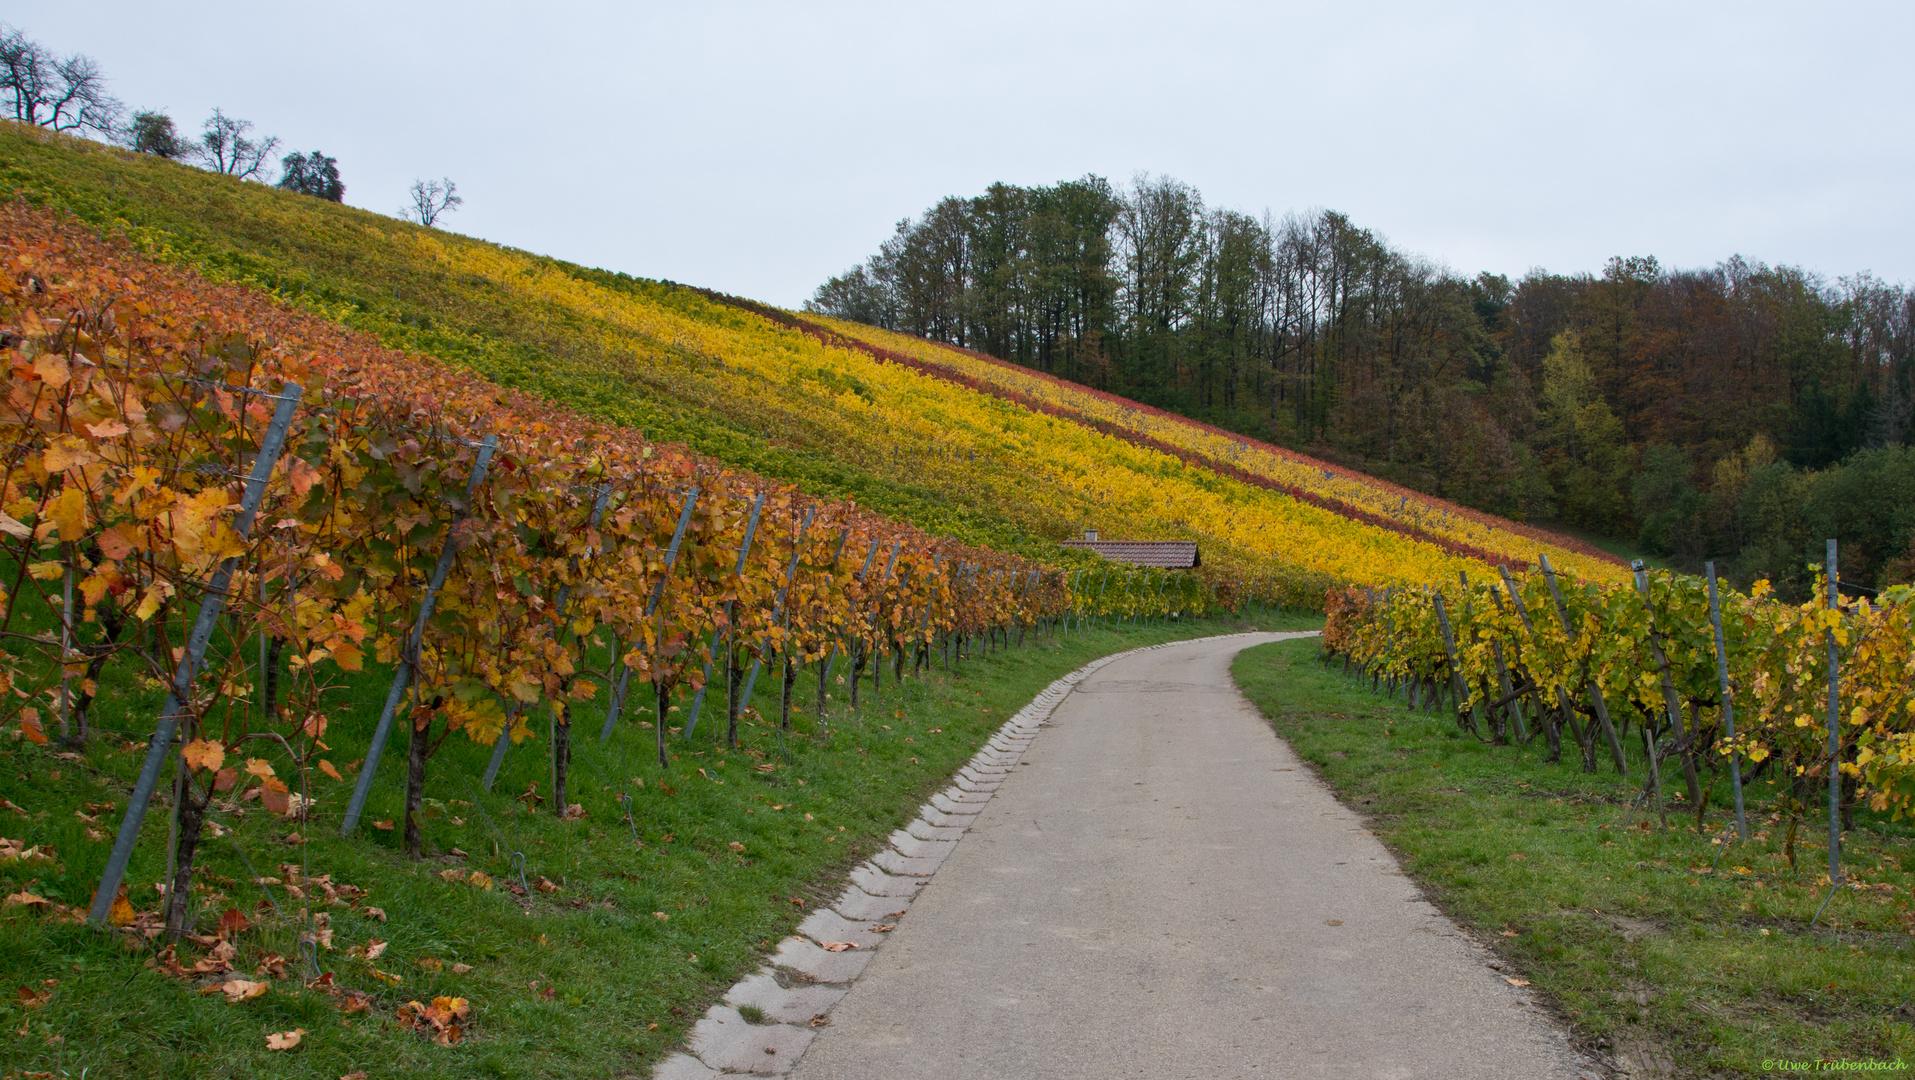 Weinberge bei Aspach im Rems-Murr-Kreis (2)